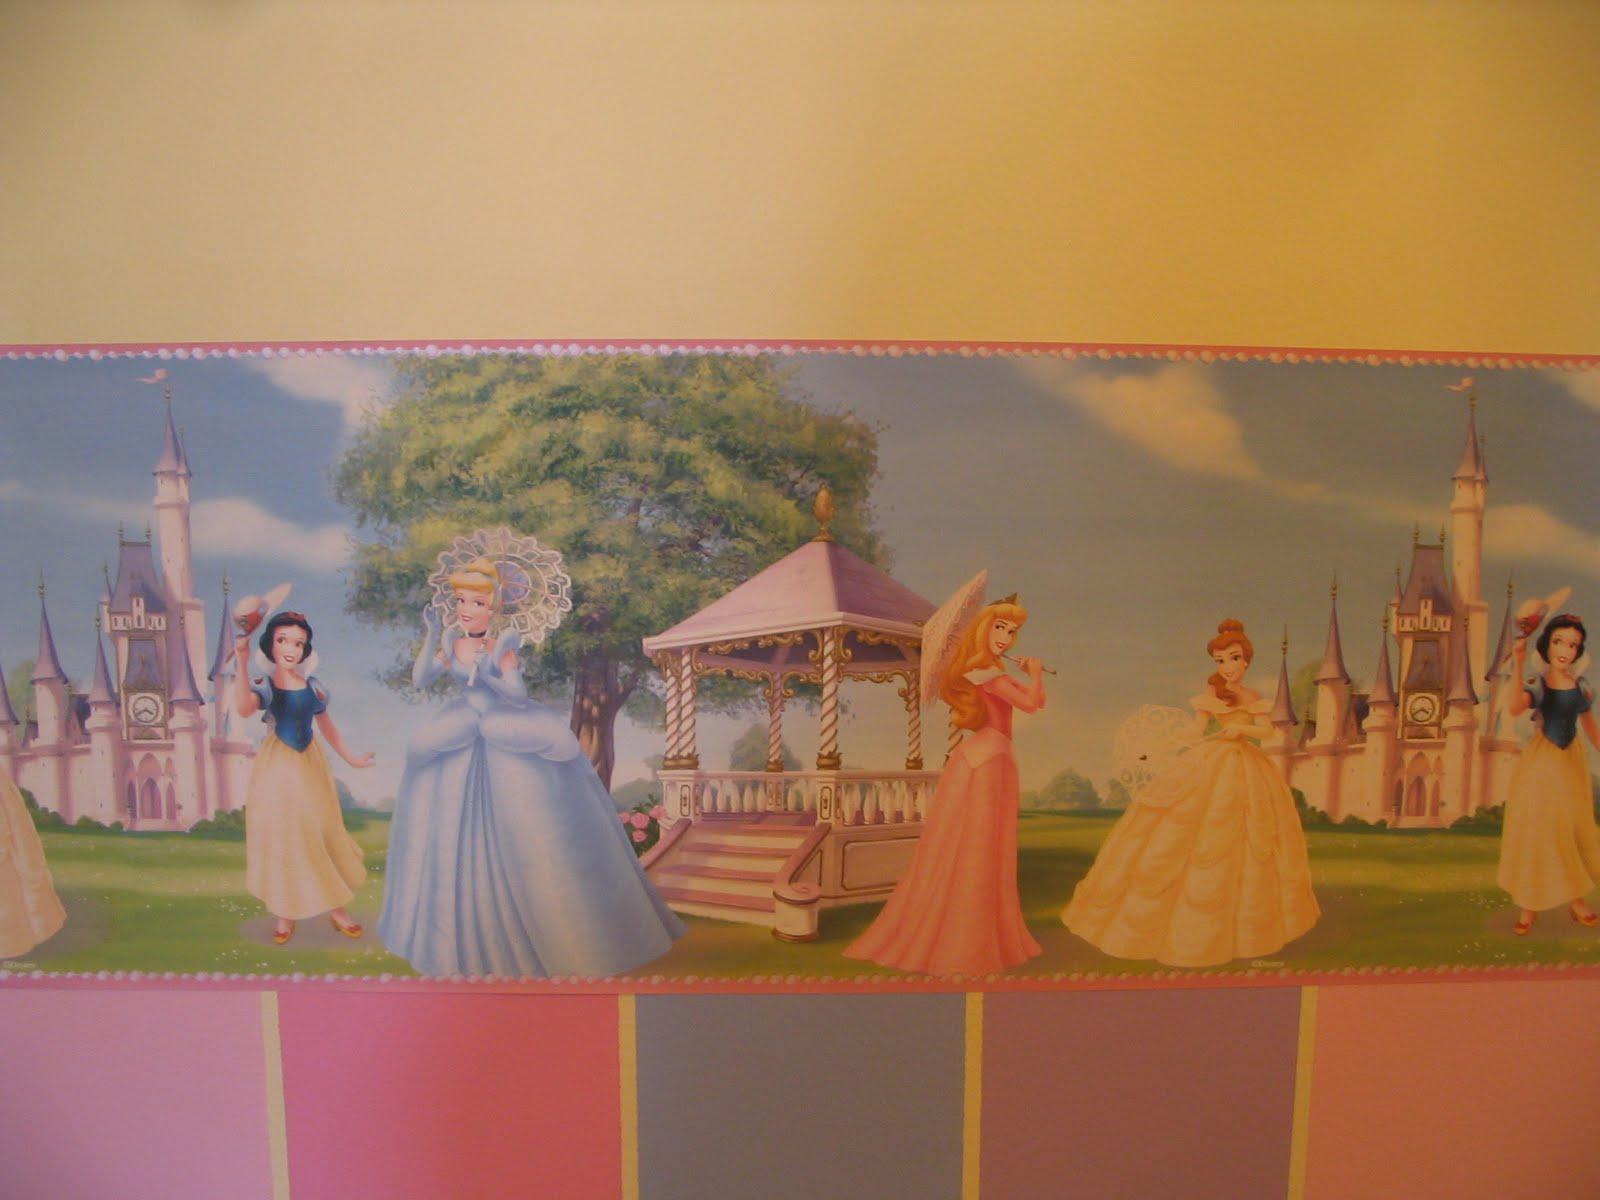 Wallpaper Borders 9 Inches 1600x1200